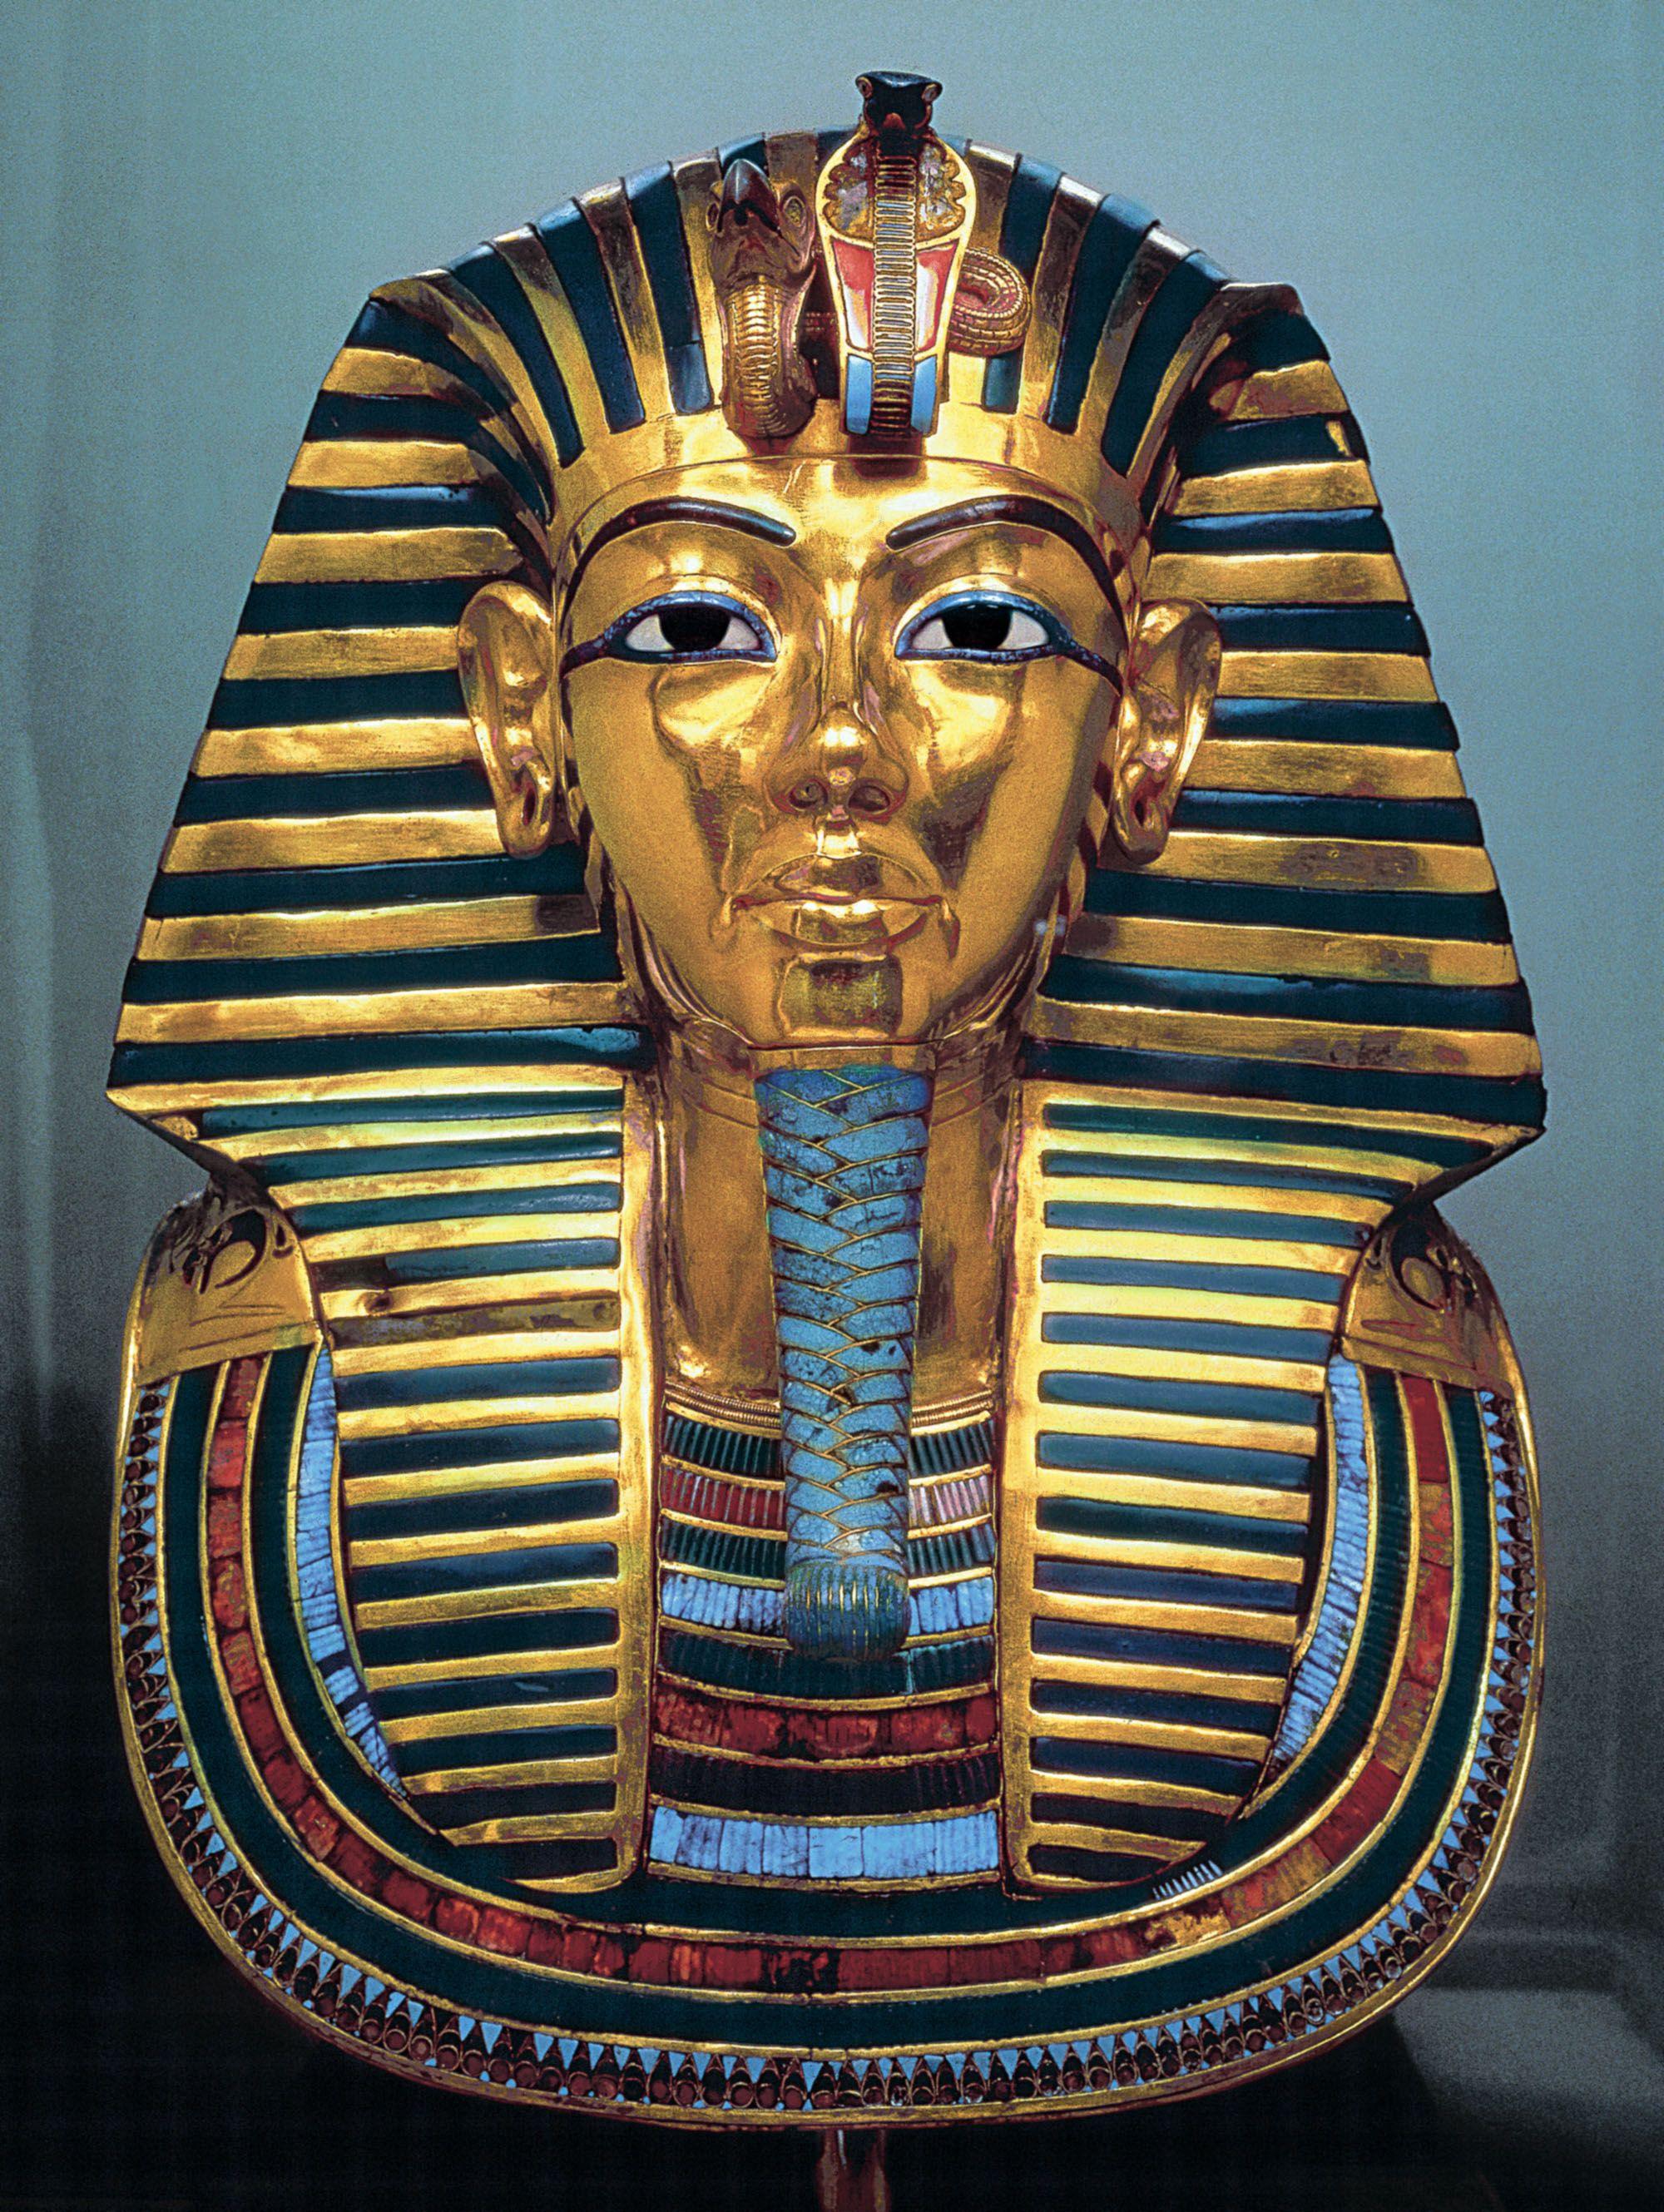 The Curse Of King Tuts Tomb Torrent: Funerary Mask Of Tutankhamun